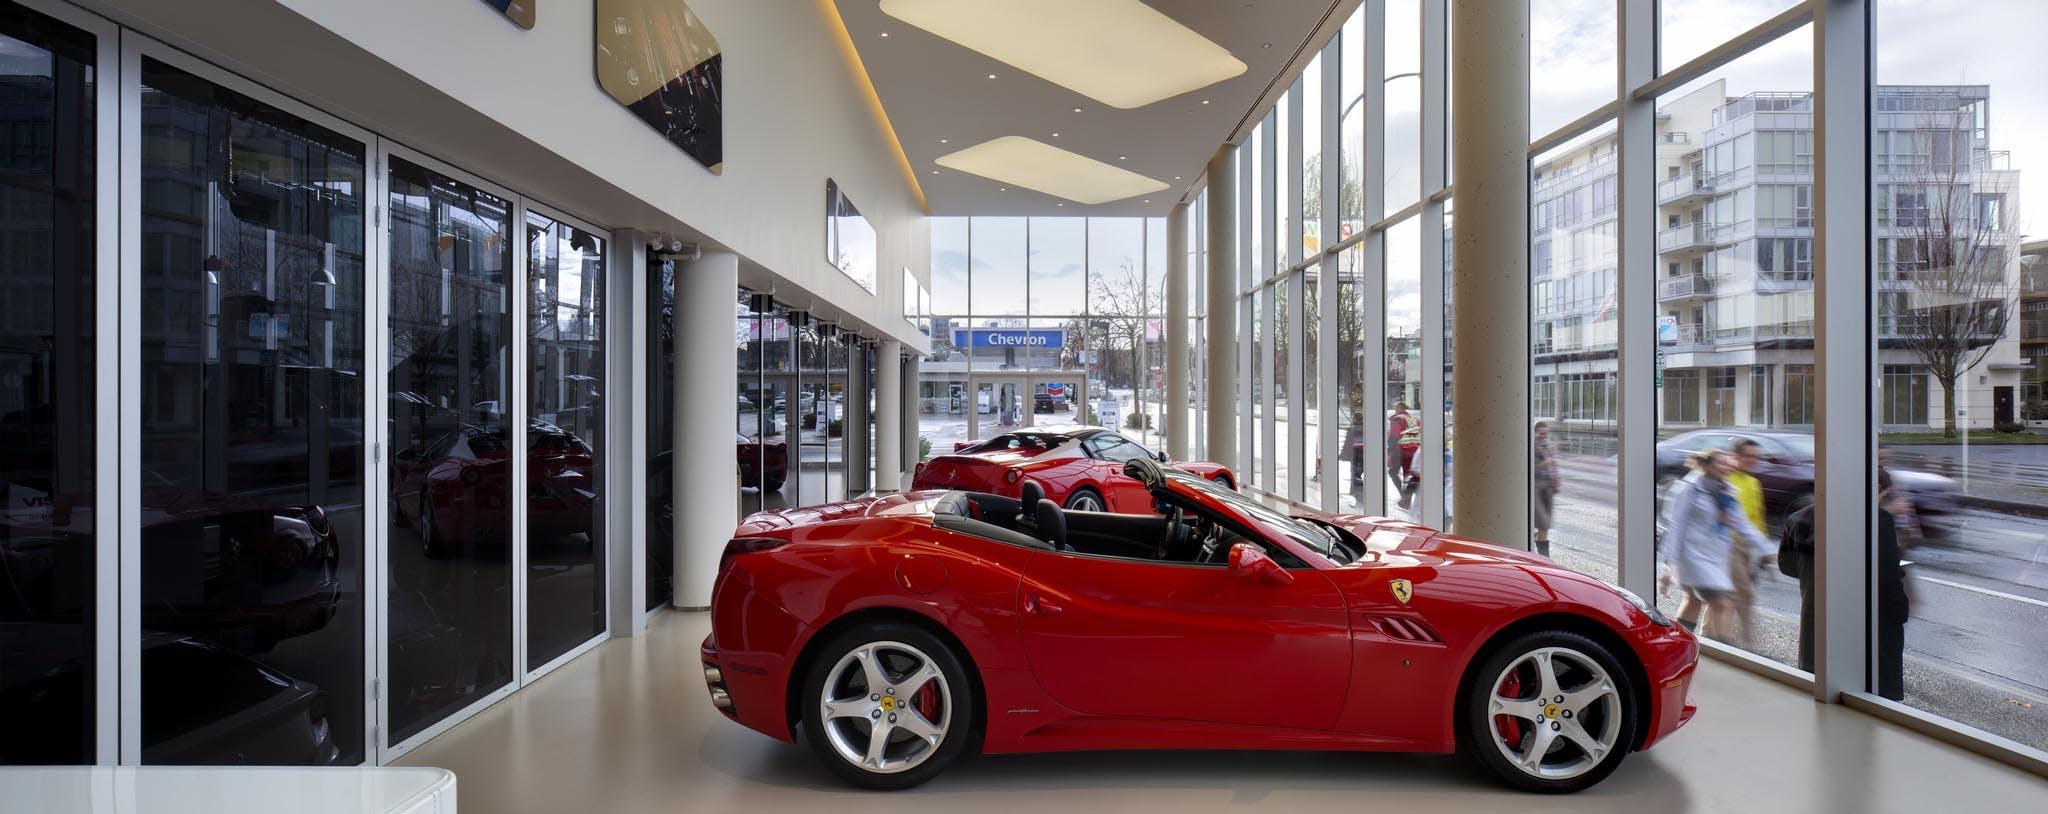 Ferrari Maserati Of Vancouver Nanawall